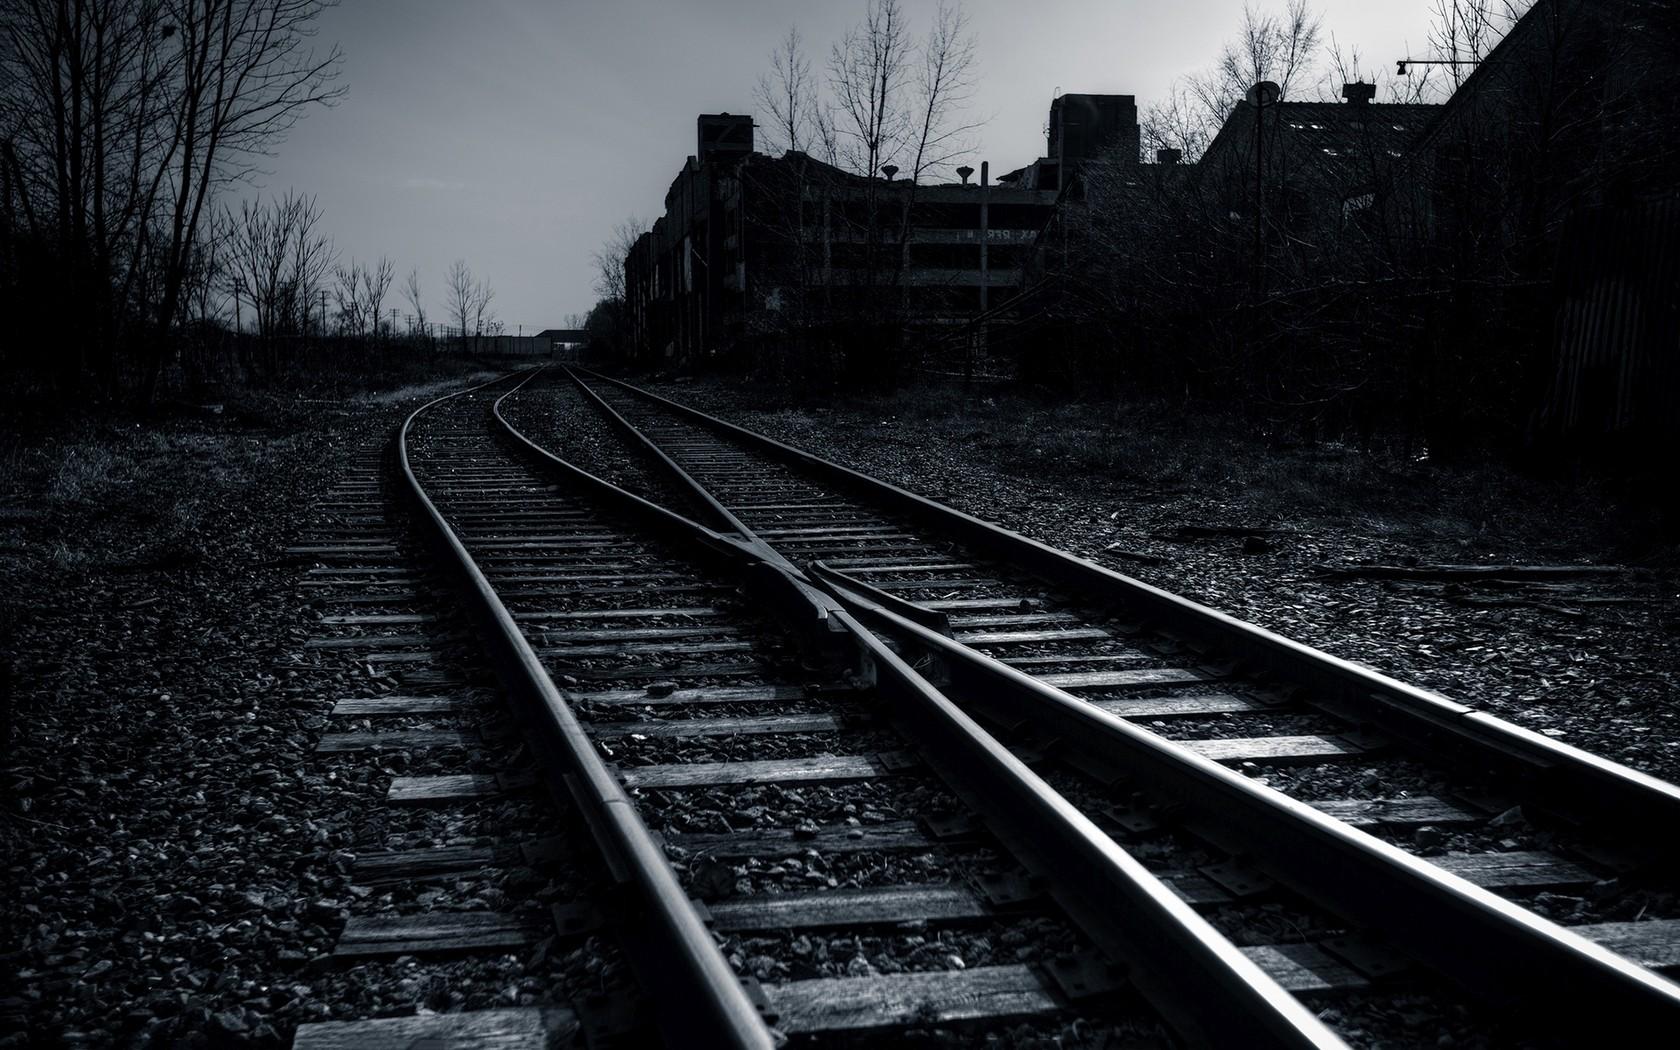 dark, vehicle, train, railway